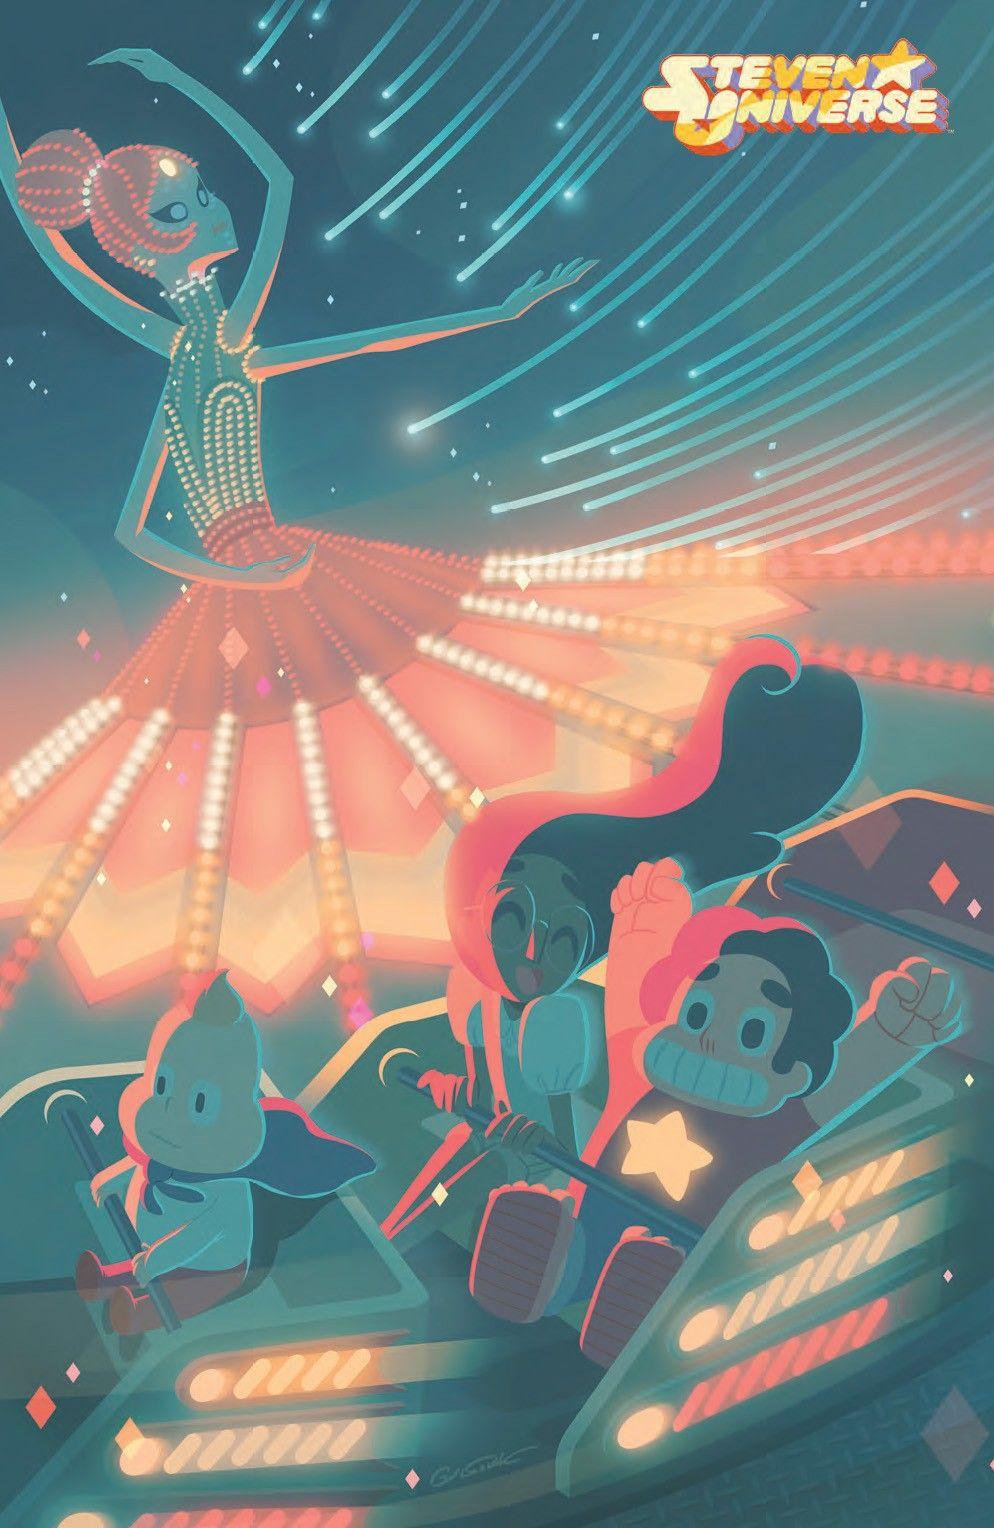 Universe iphone wallpaper tumblr - Steven Universe 03 Cover C